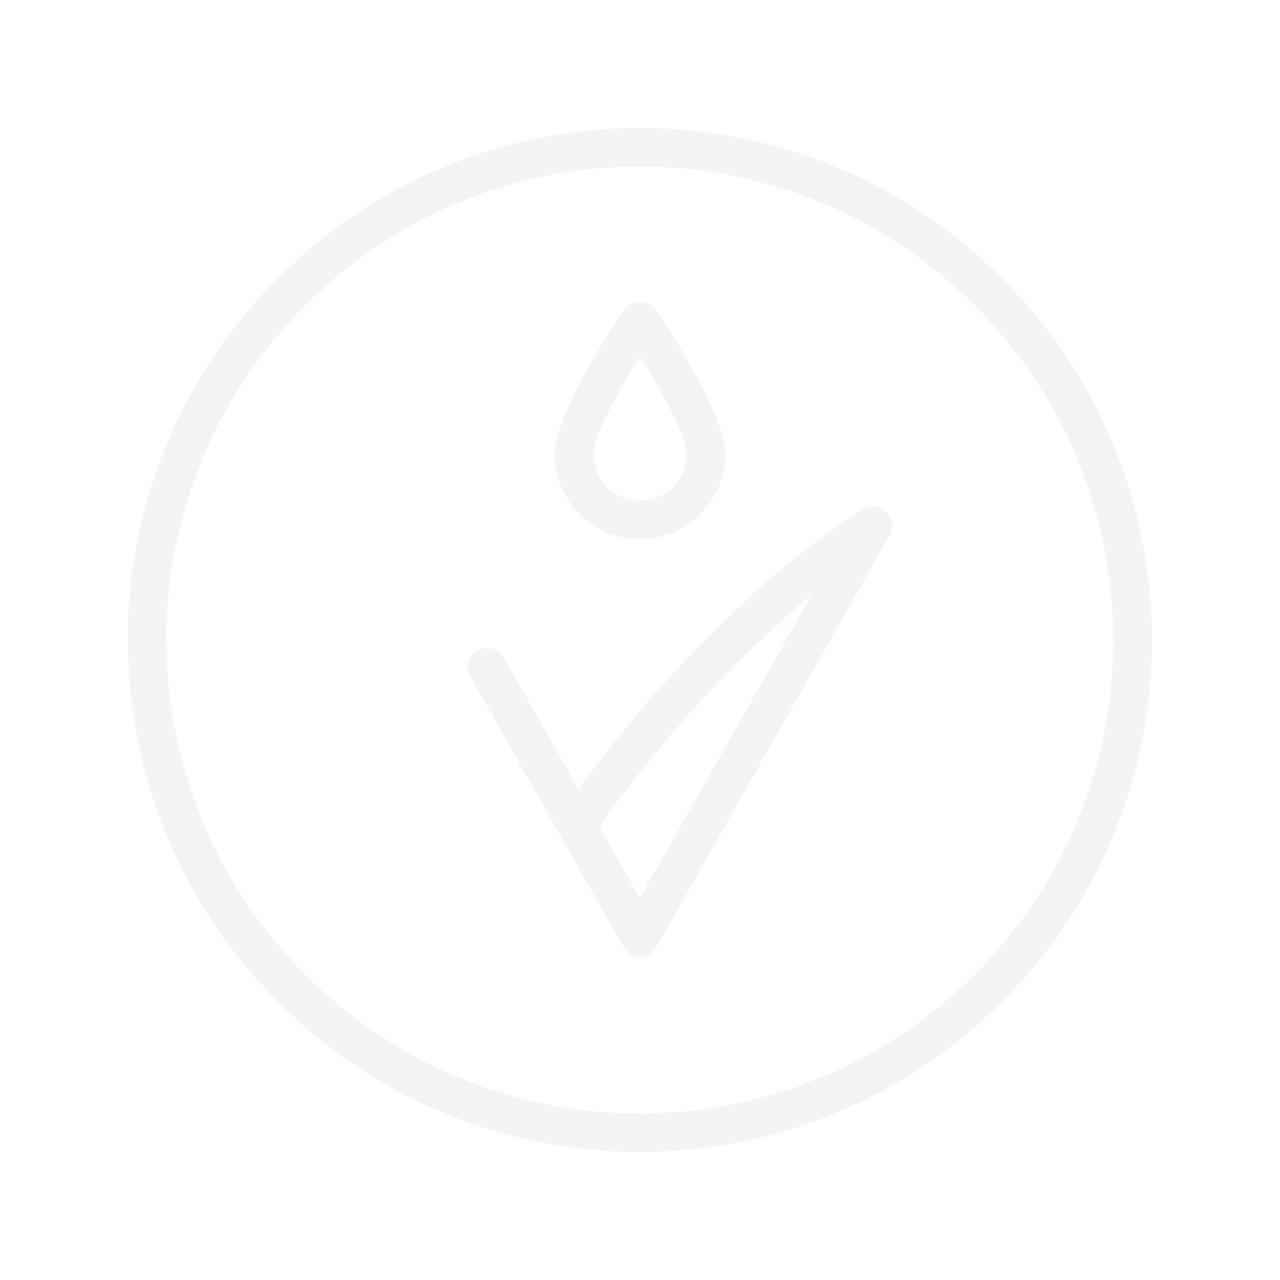 GOLDWELL Kerasilk Repower Volume Dry Shampoo сухой шампунь для объема тонких волос 200ml